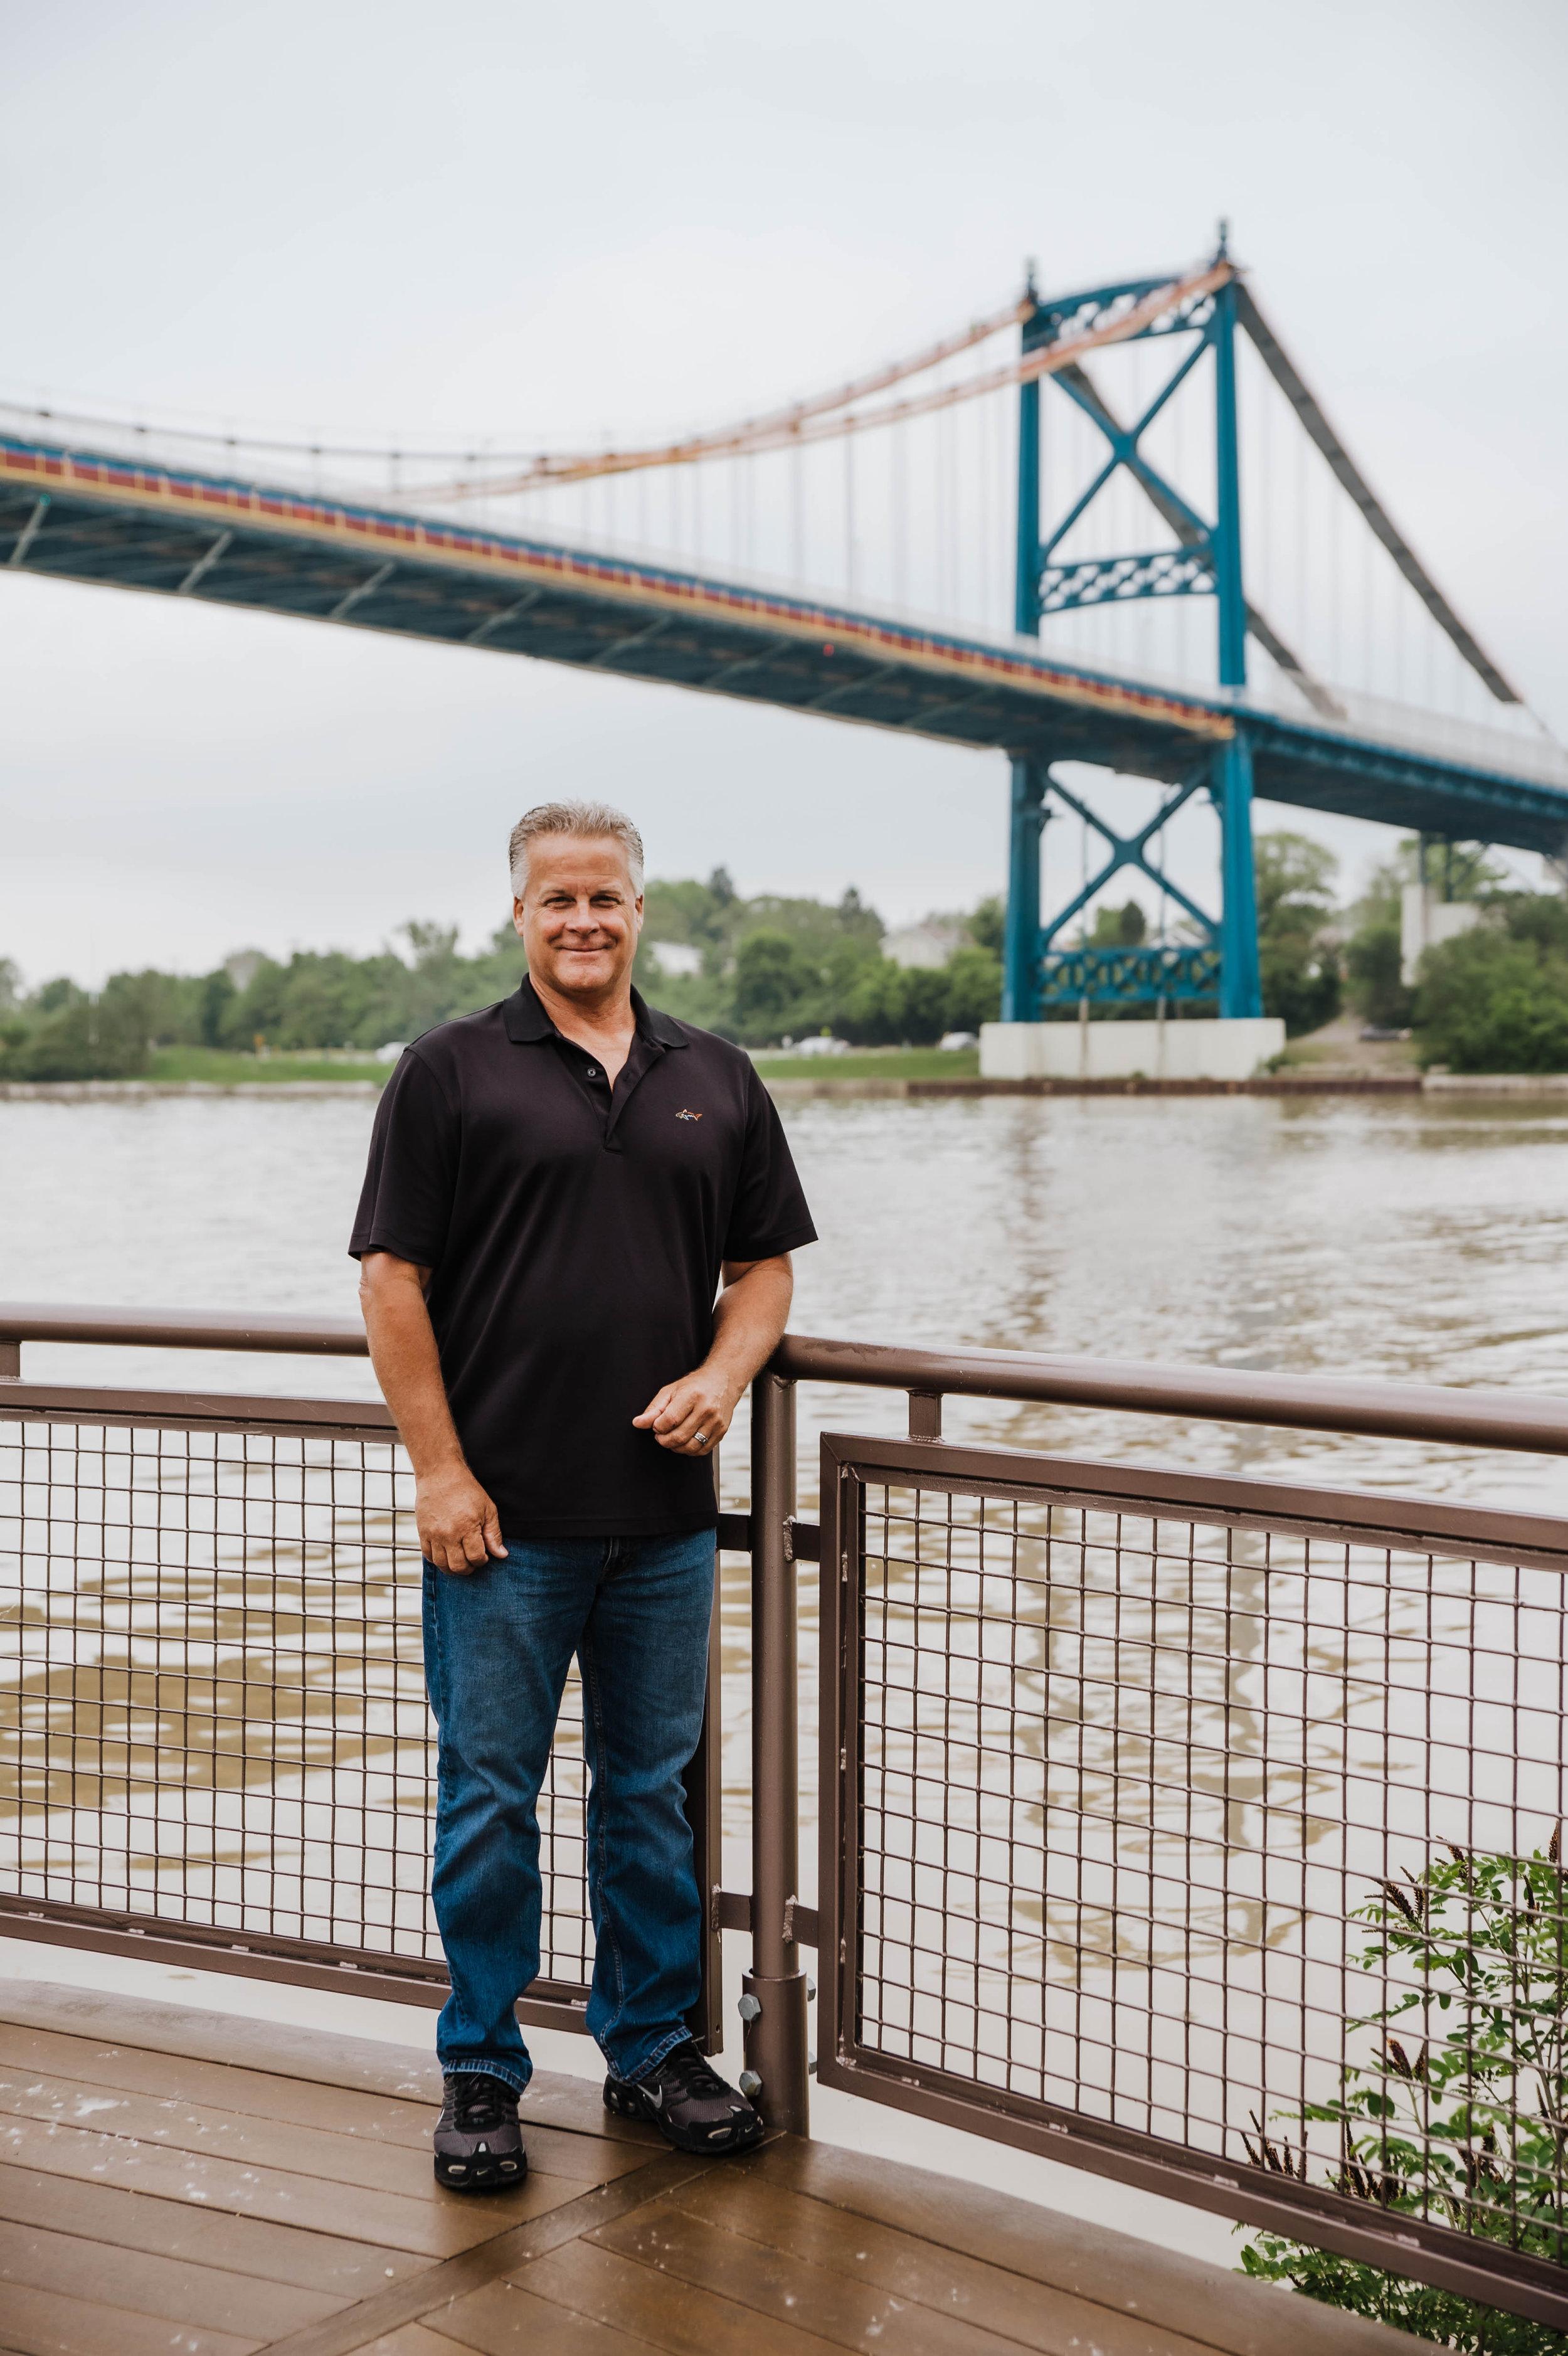 Jim Starr, Bridge Operations Manager/Estimator